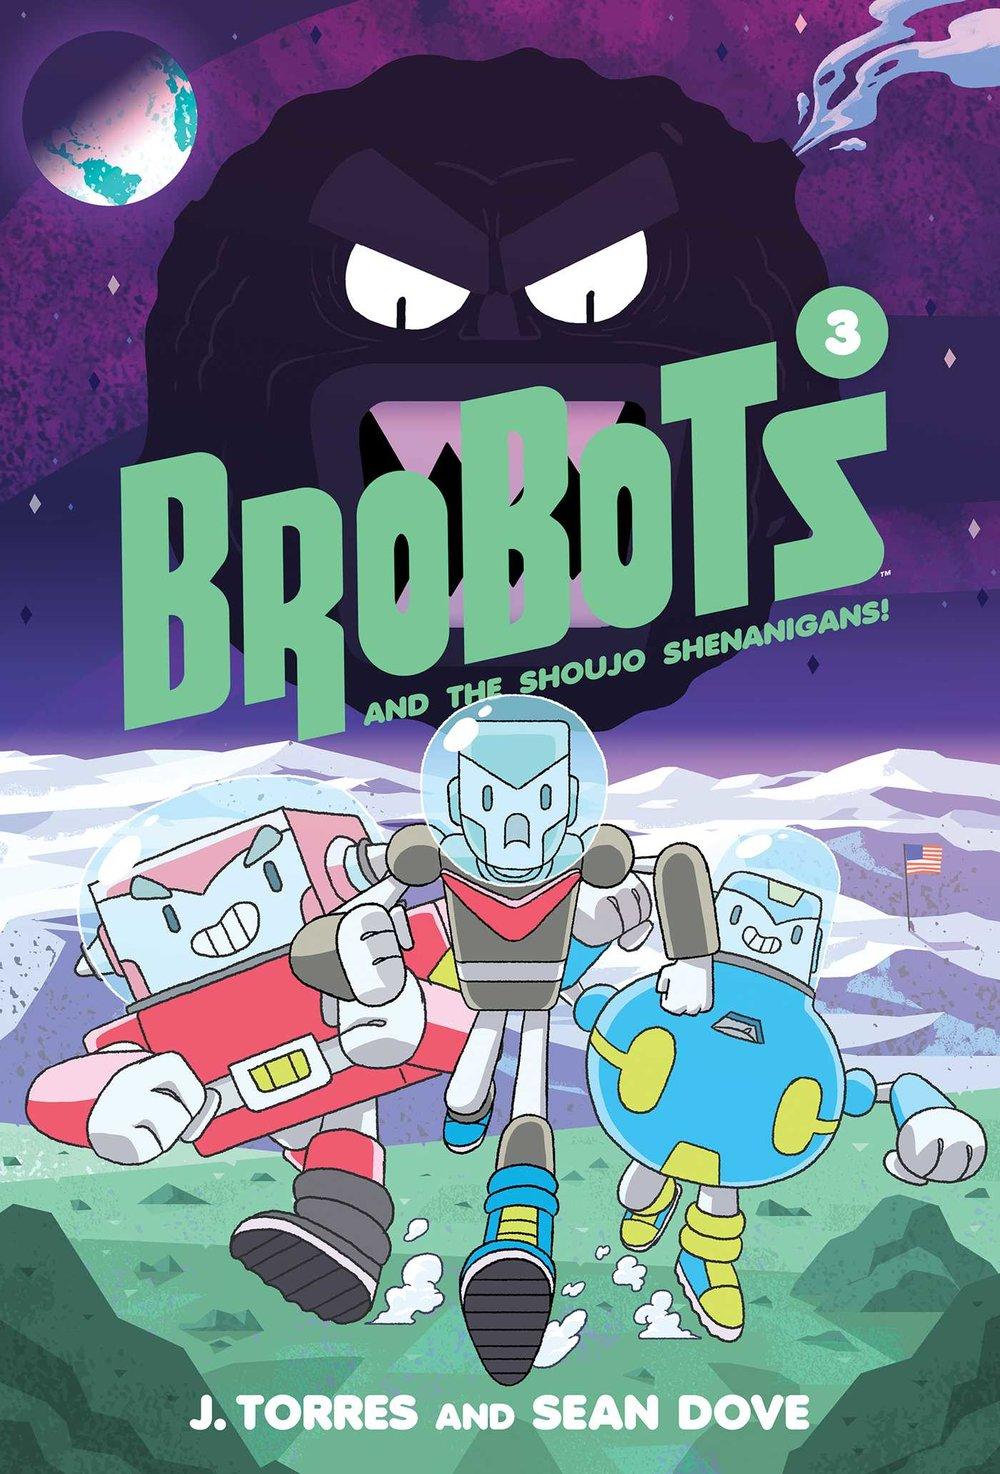 brobots-and-the-shoujo-shenanigans-9781620105214_hr.jpg